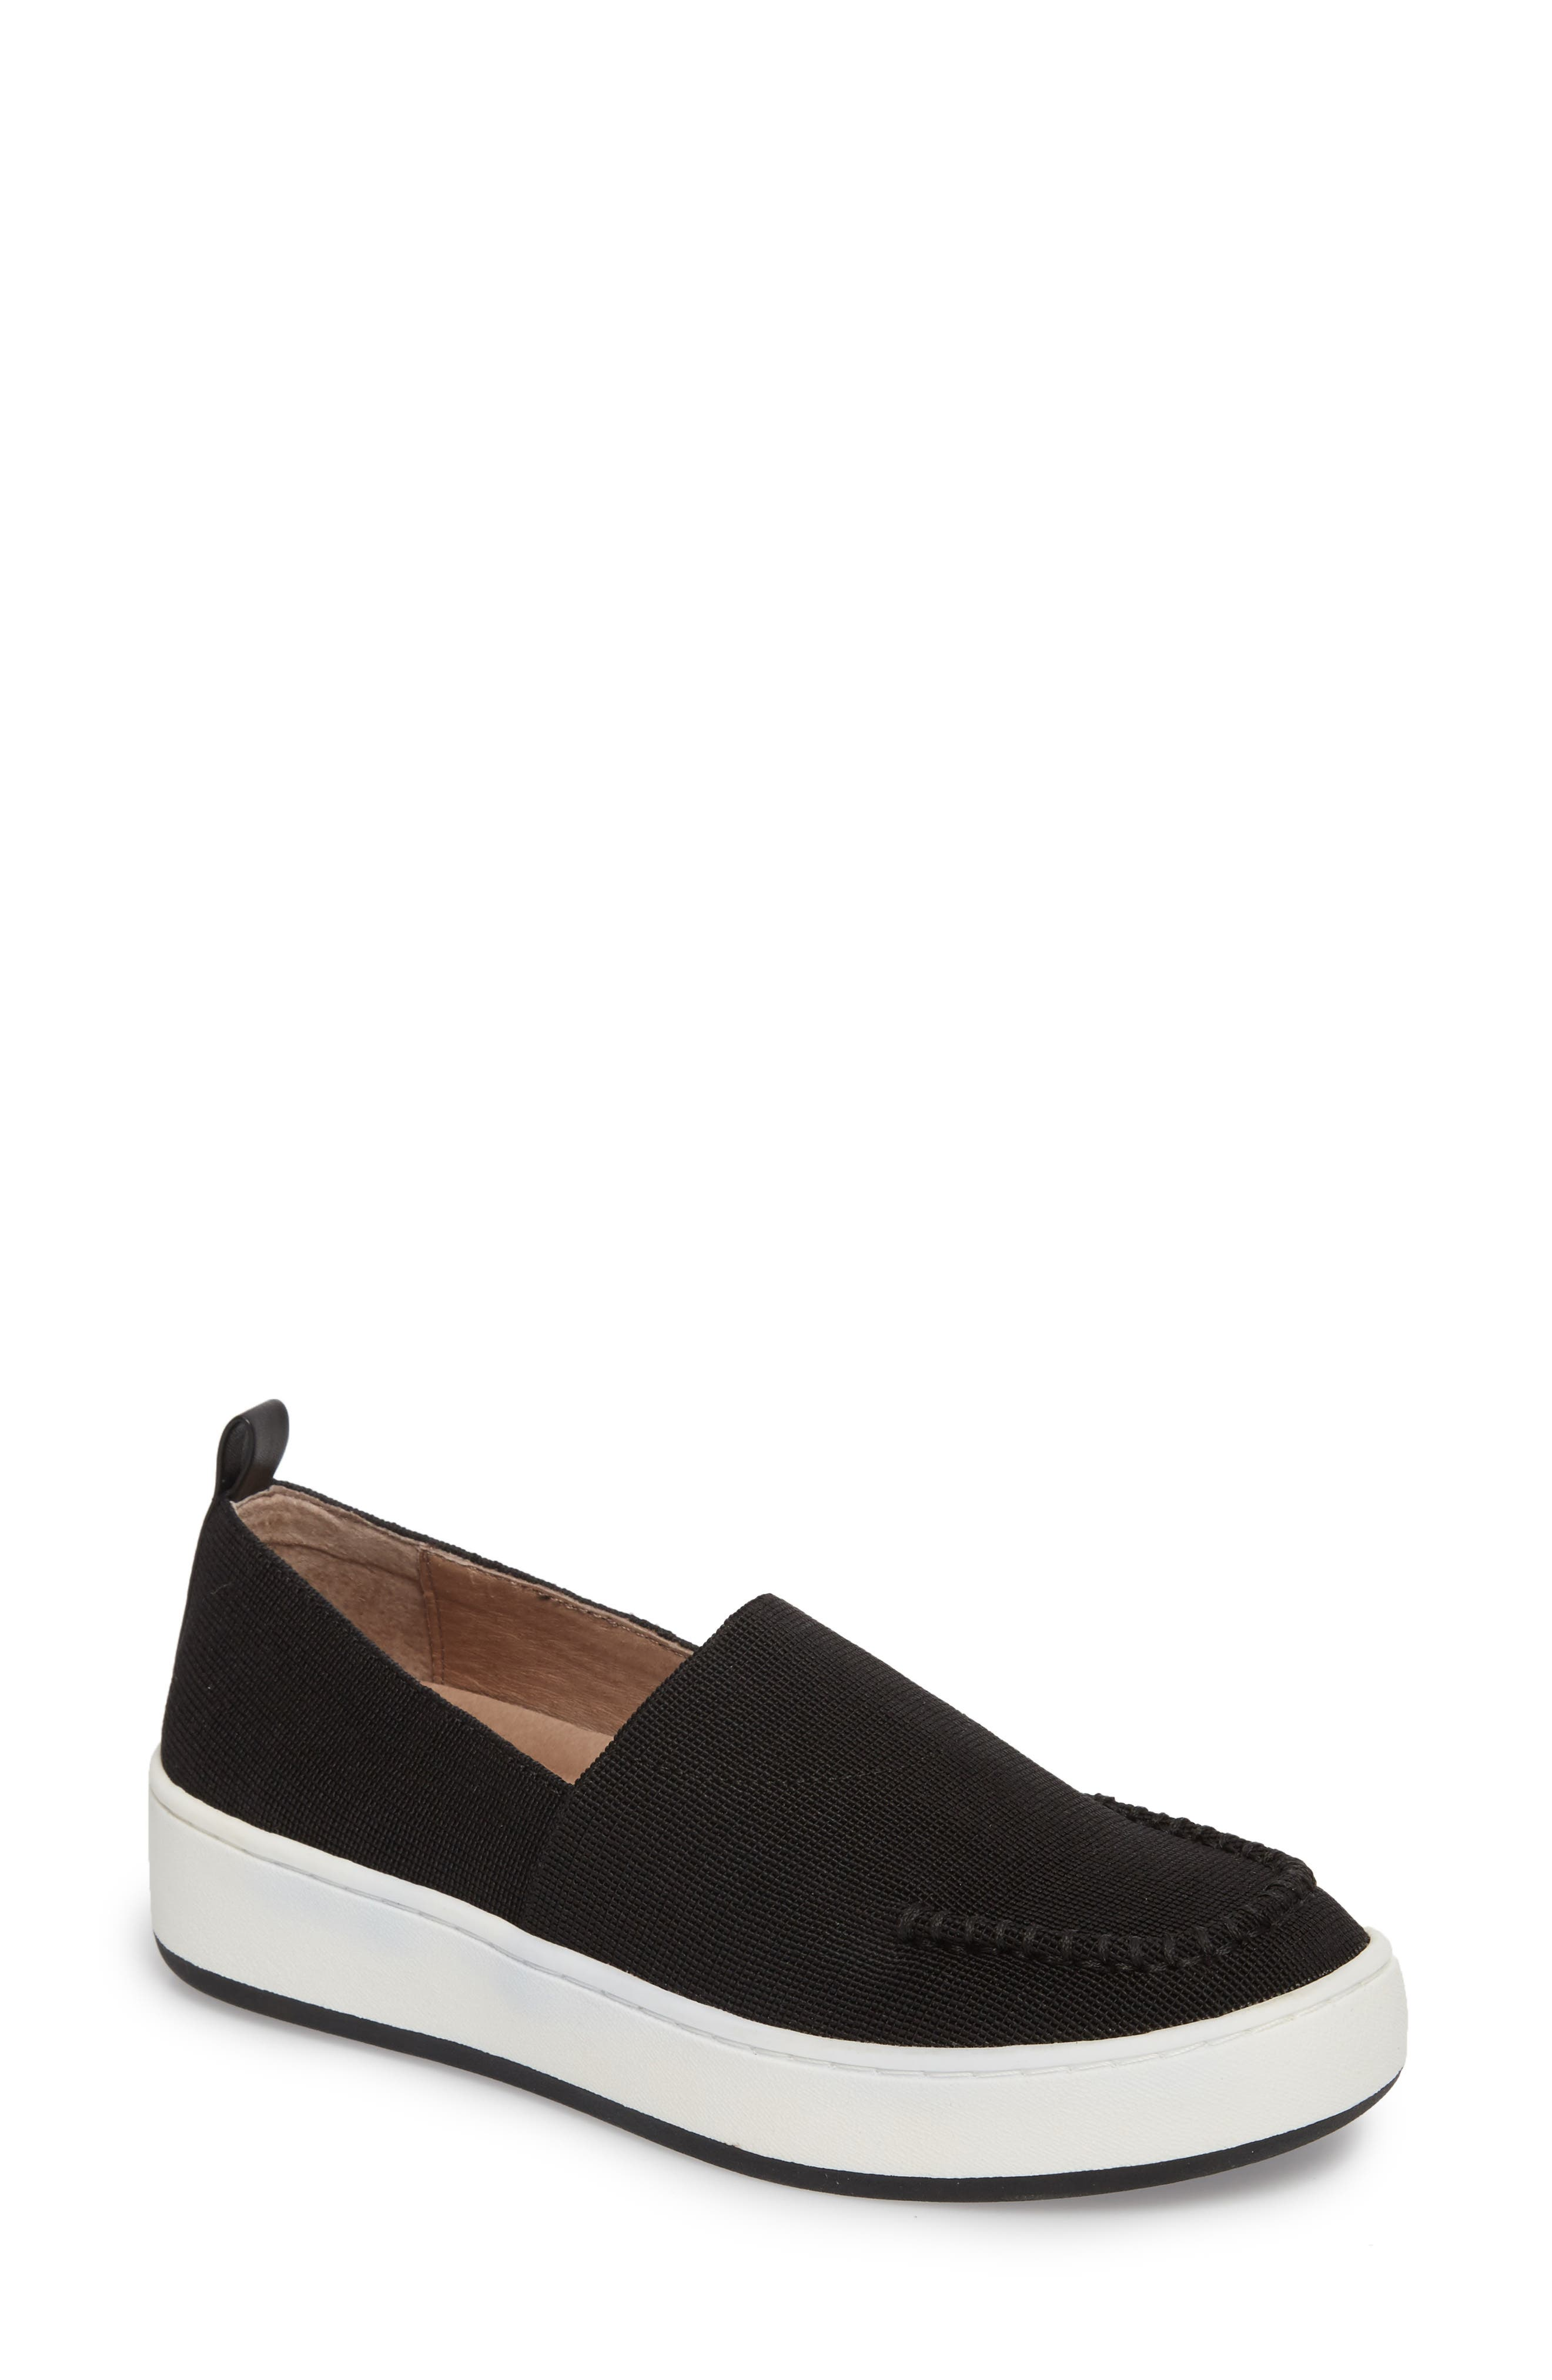 Cory Slip-On Sneaker,                         Main,                         color, Black Elastic Fabric